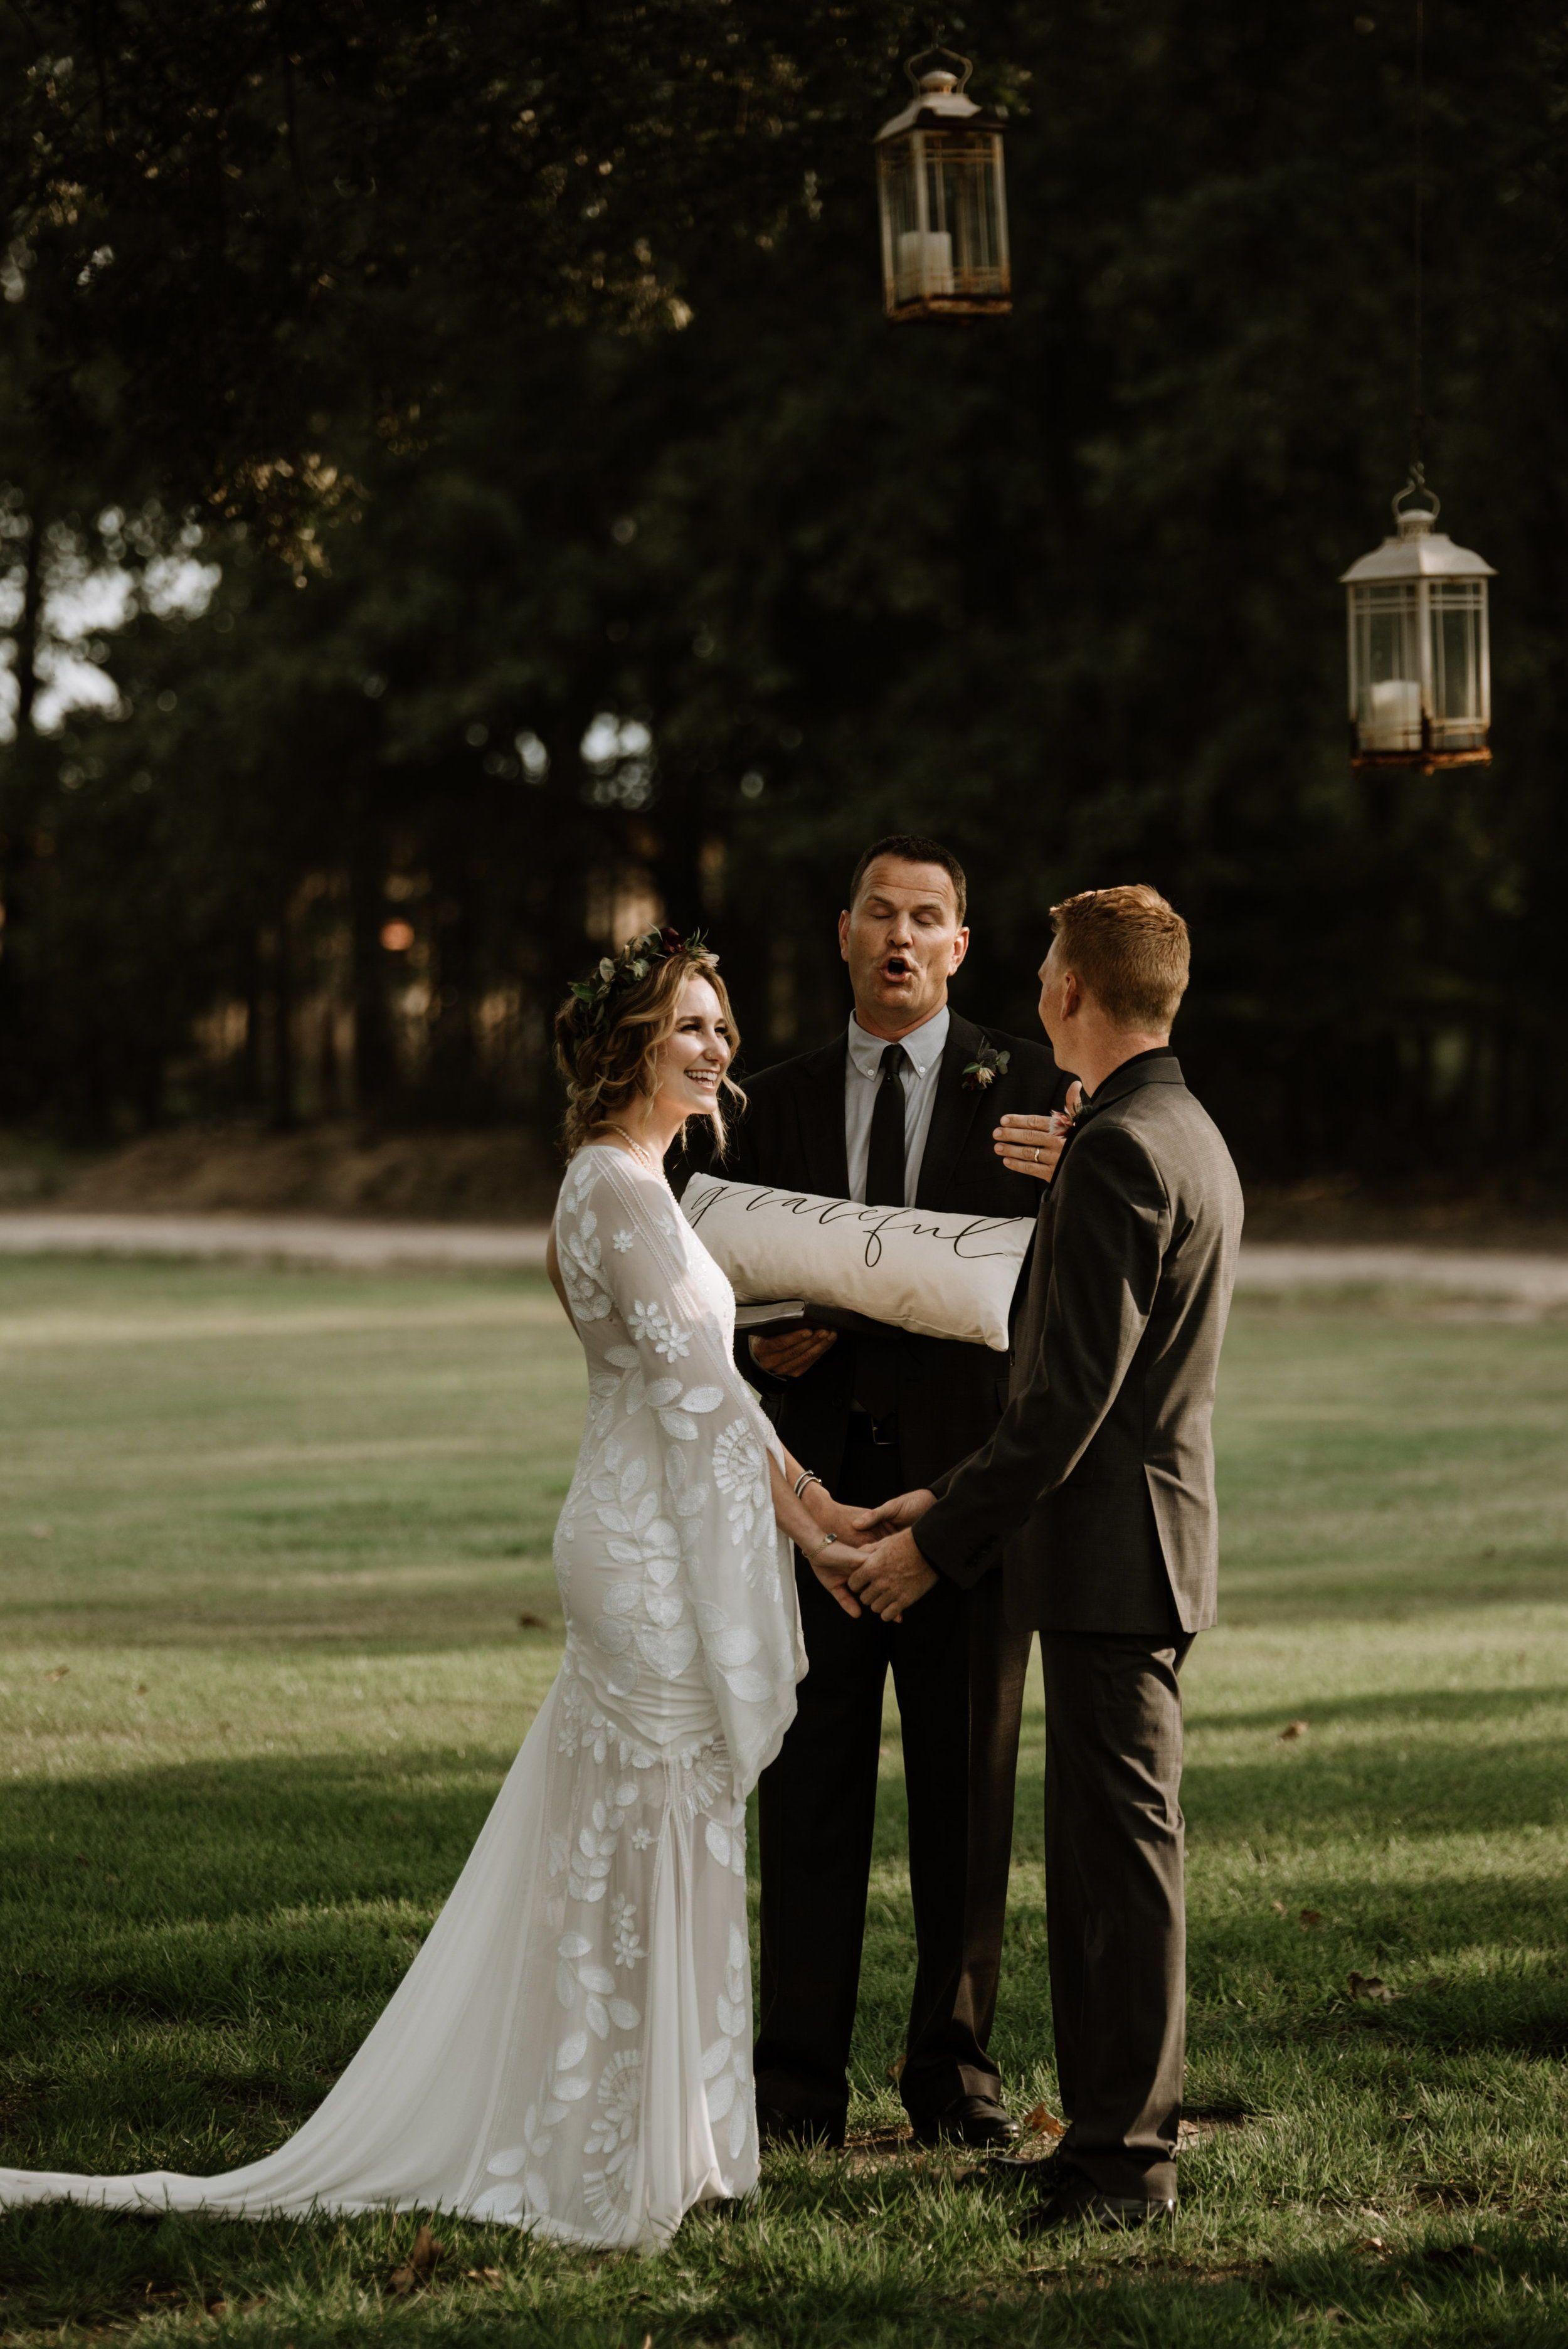 Real wedding alexandria mitchell romantic boho barn wedding in